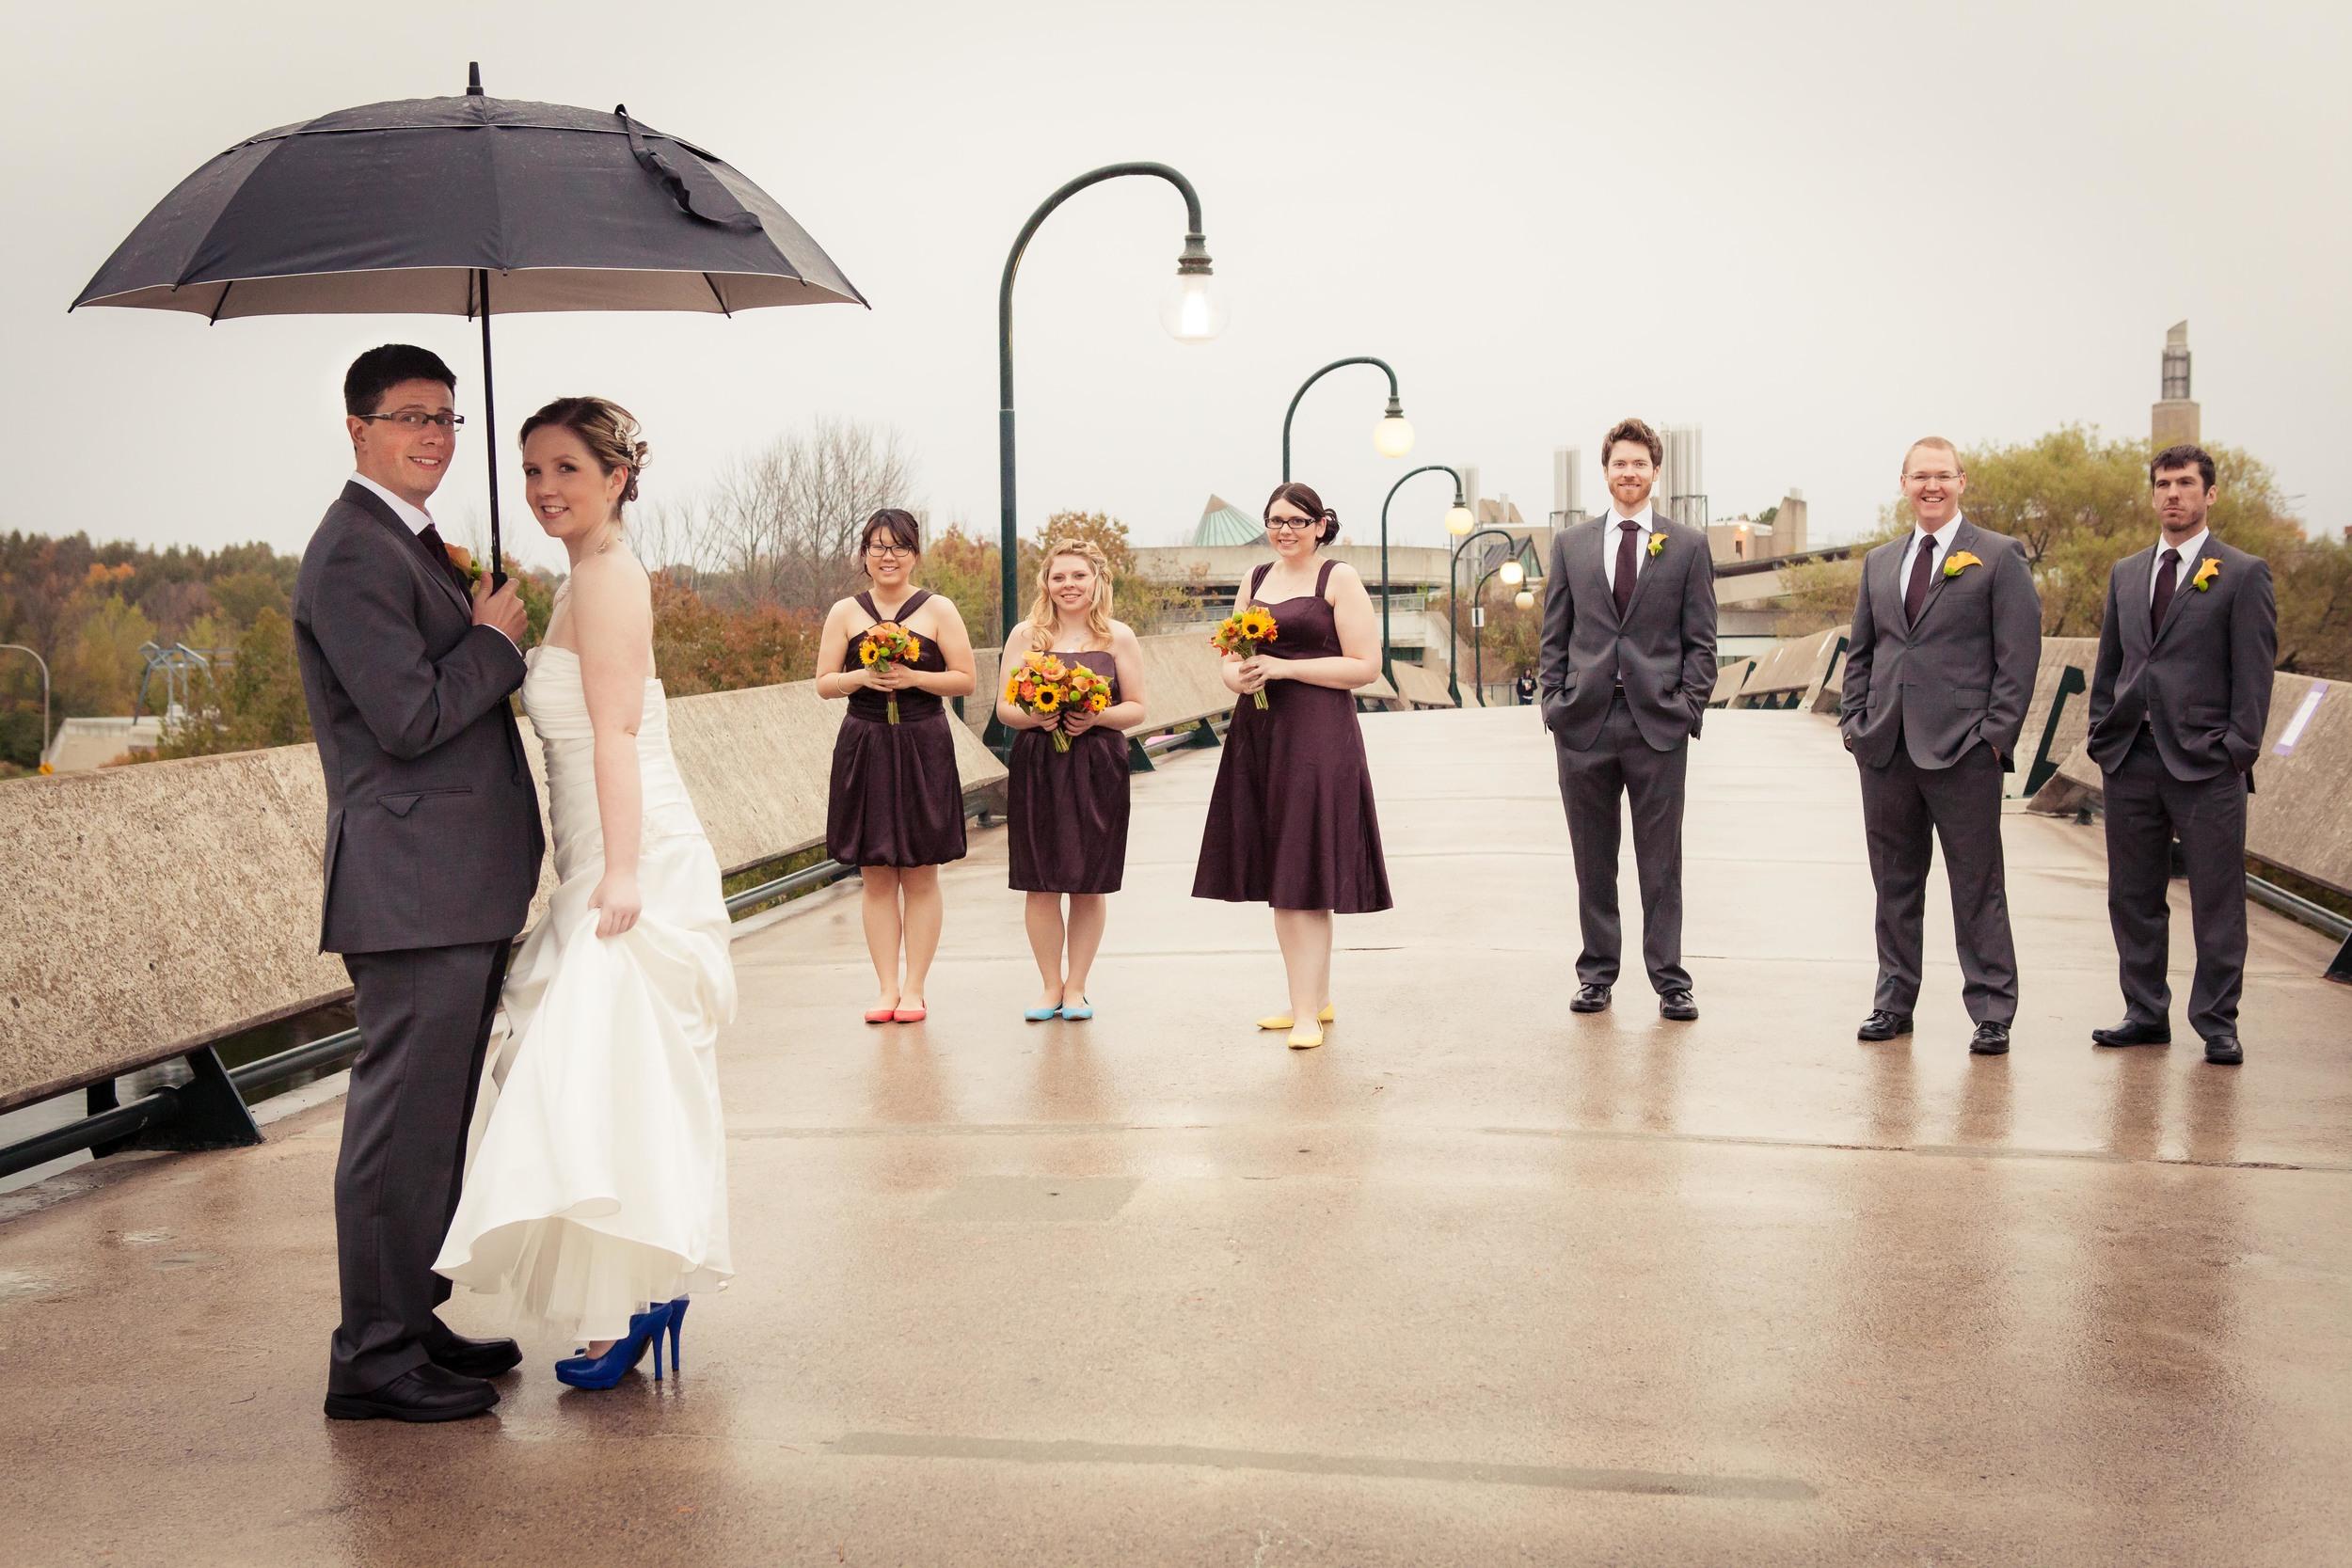 toronto_wedding_photography-Steph_Troy-15.jpg